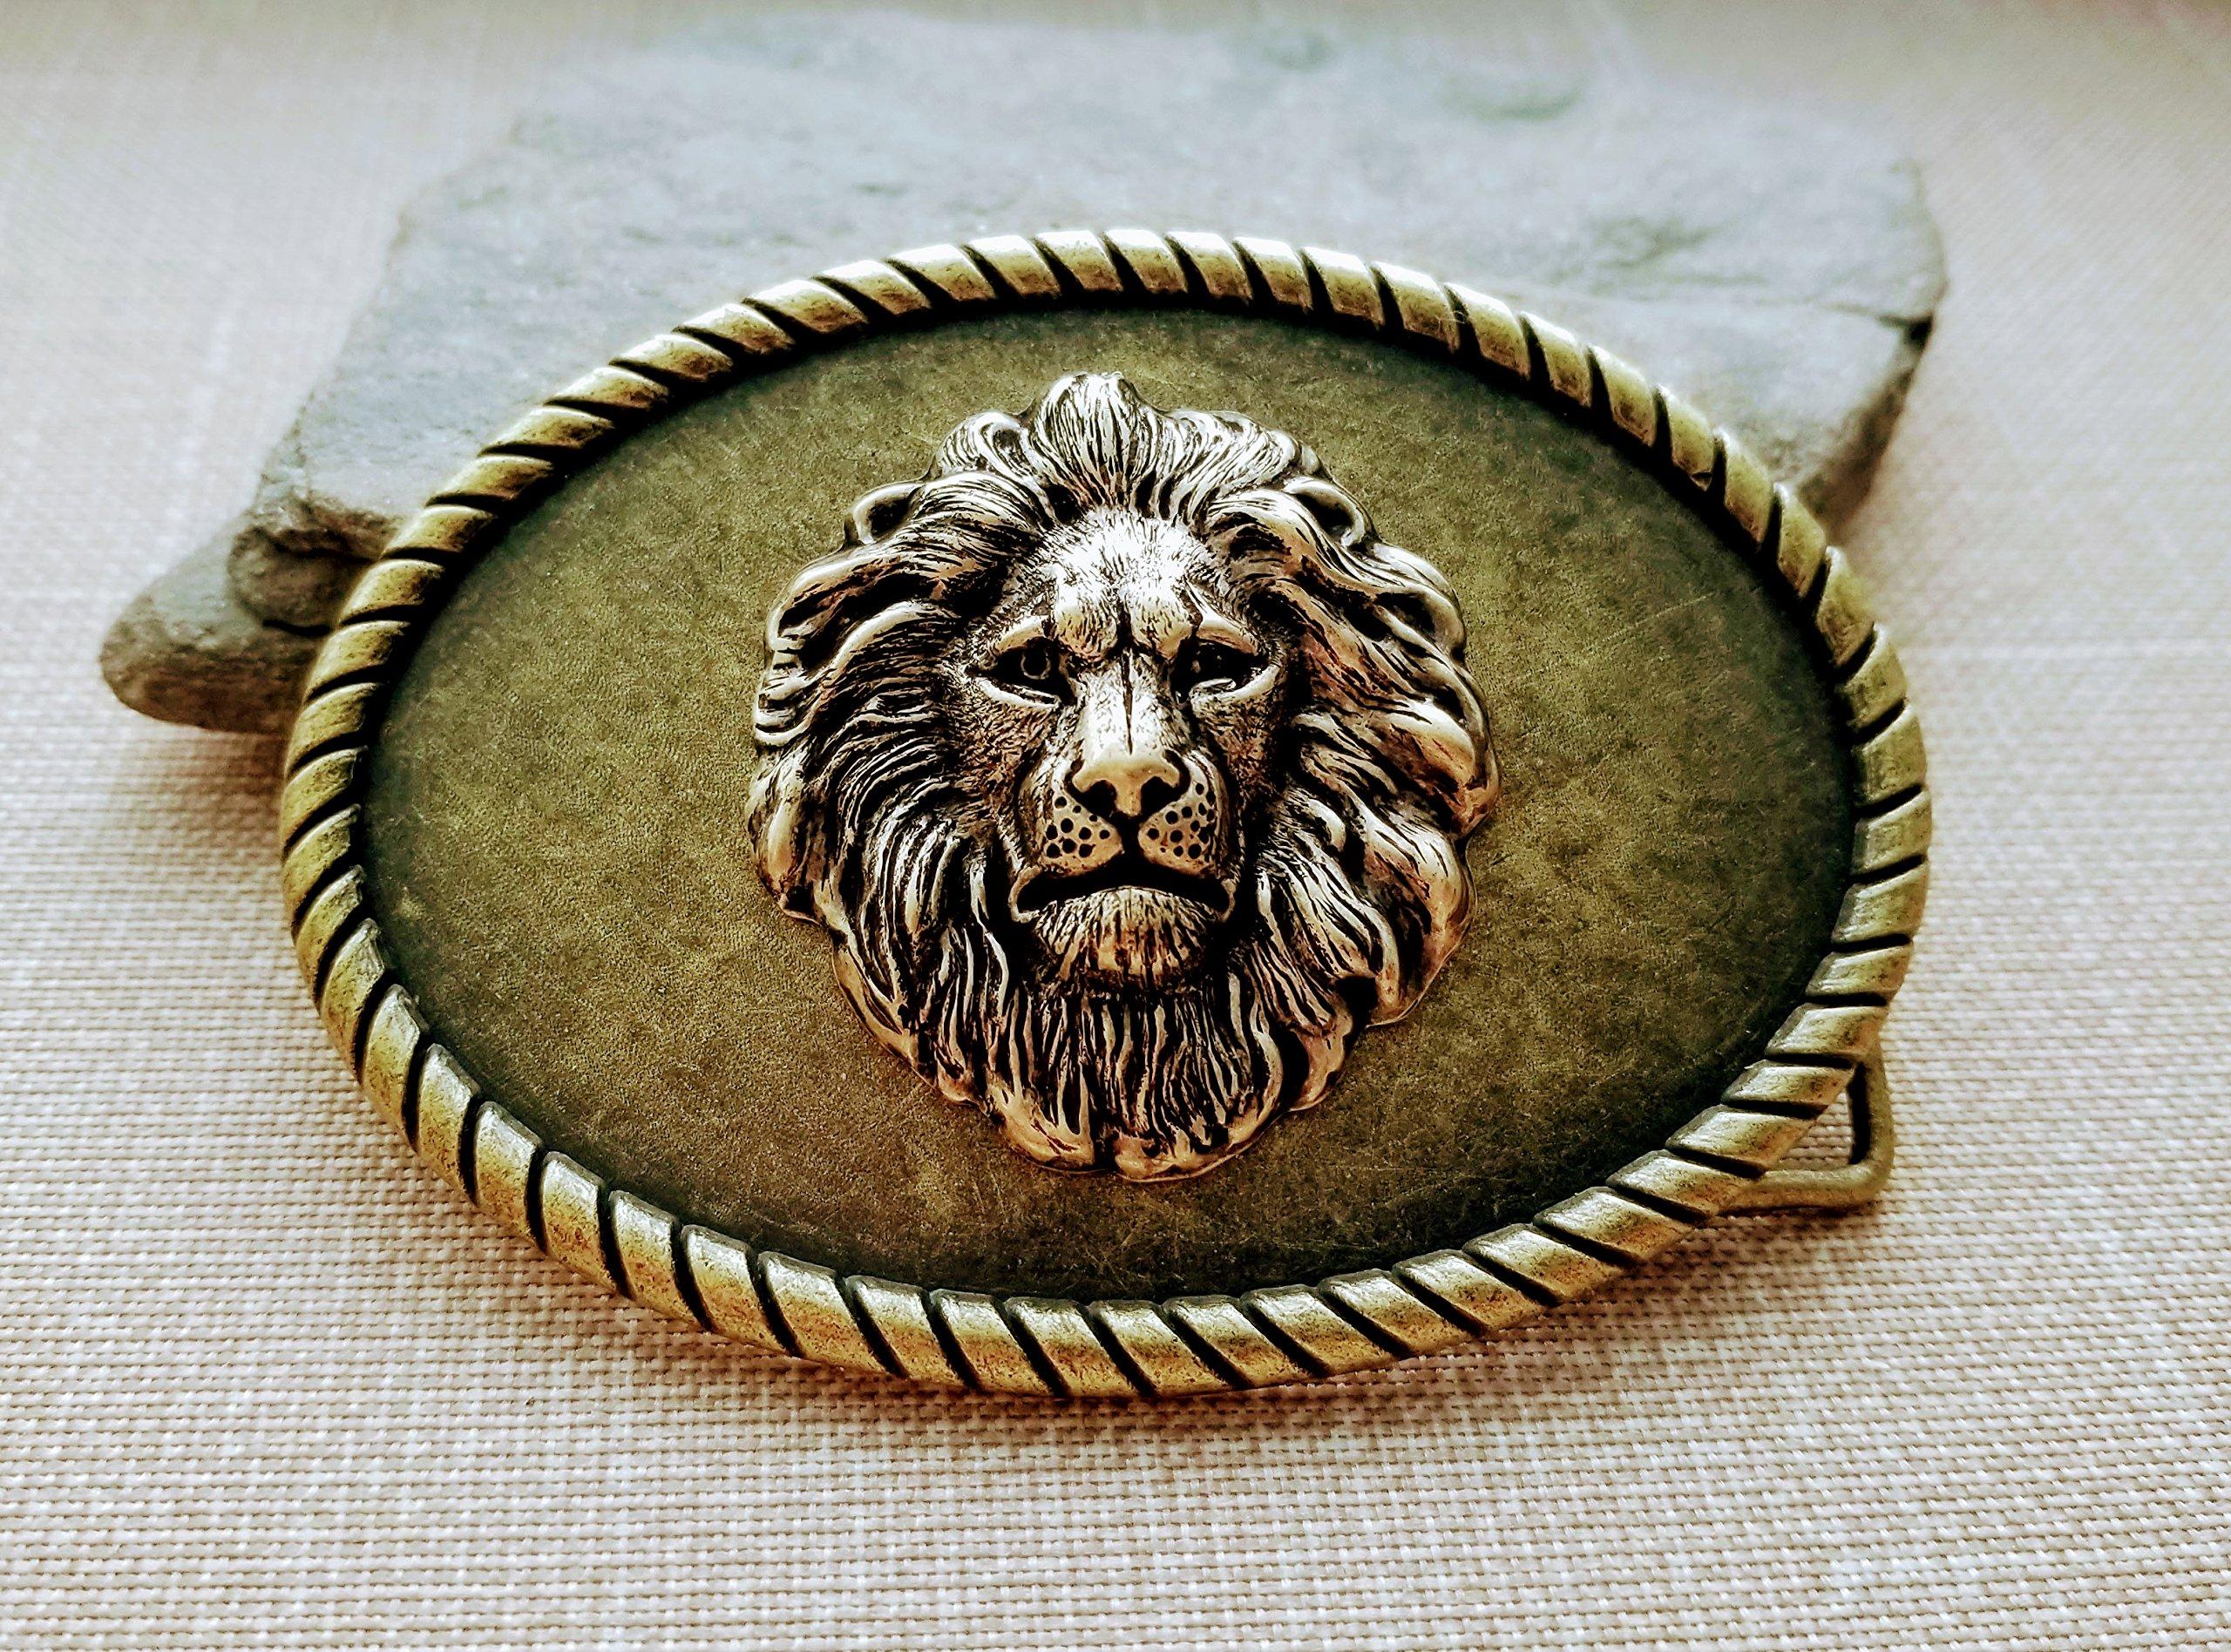 Handmade Oxidized Brass Steampunk Lion Belt Buckle by Urban Metal Designs